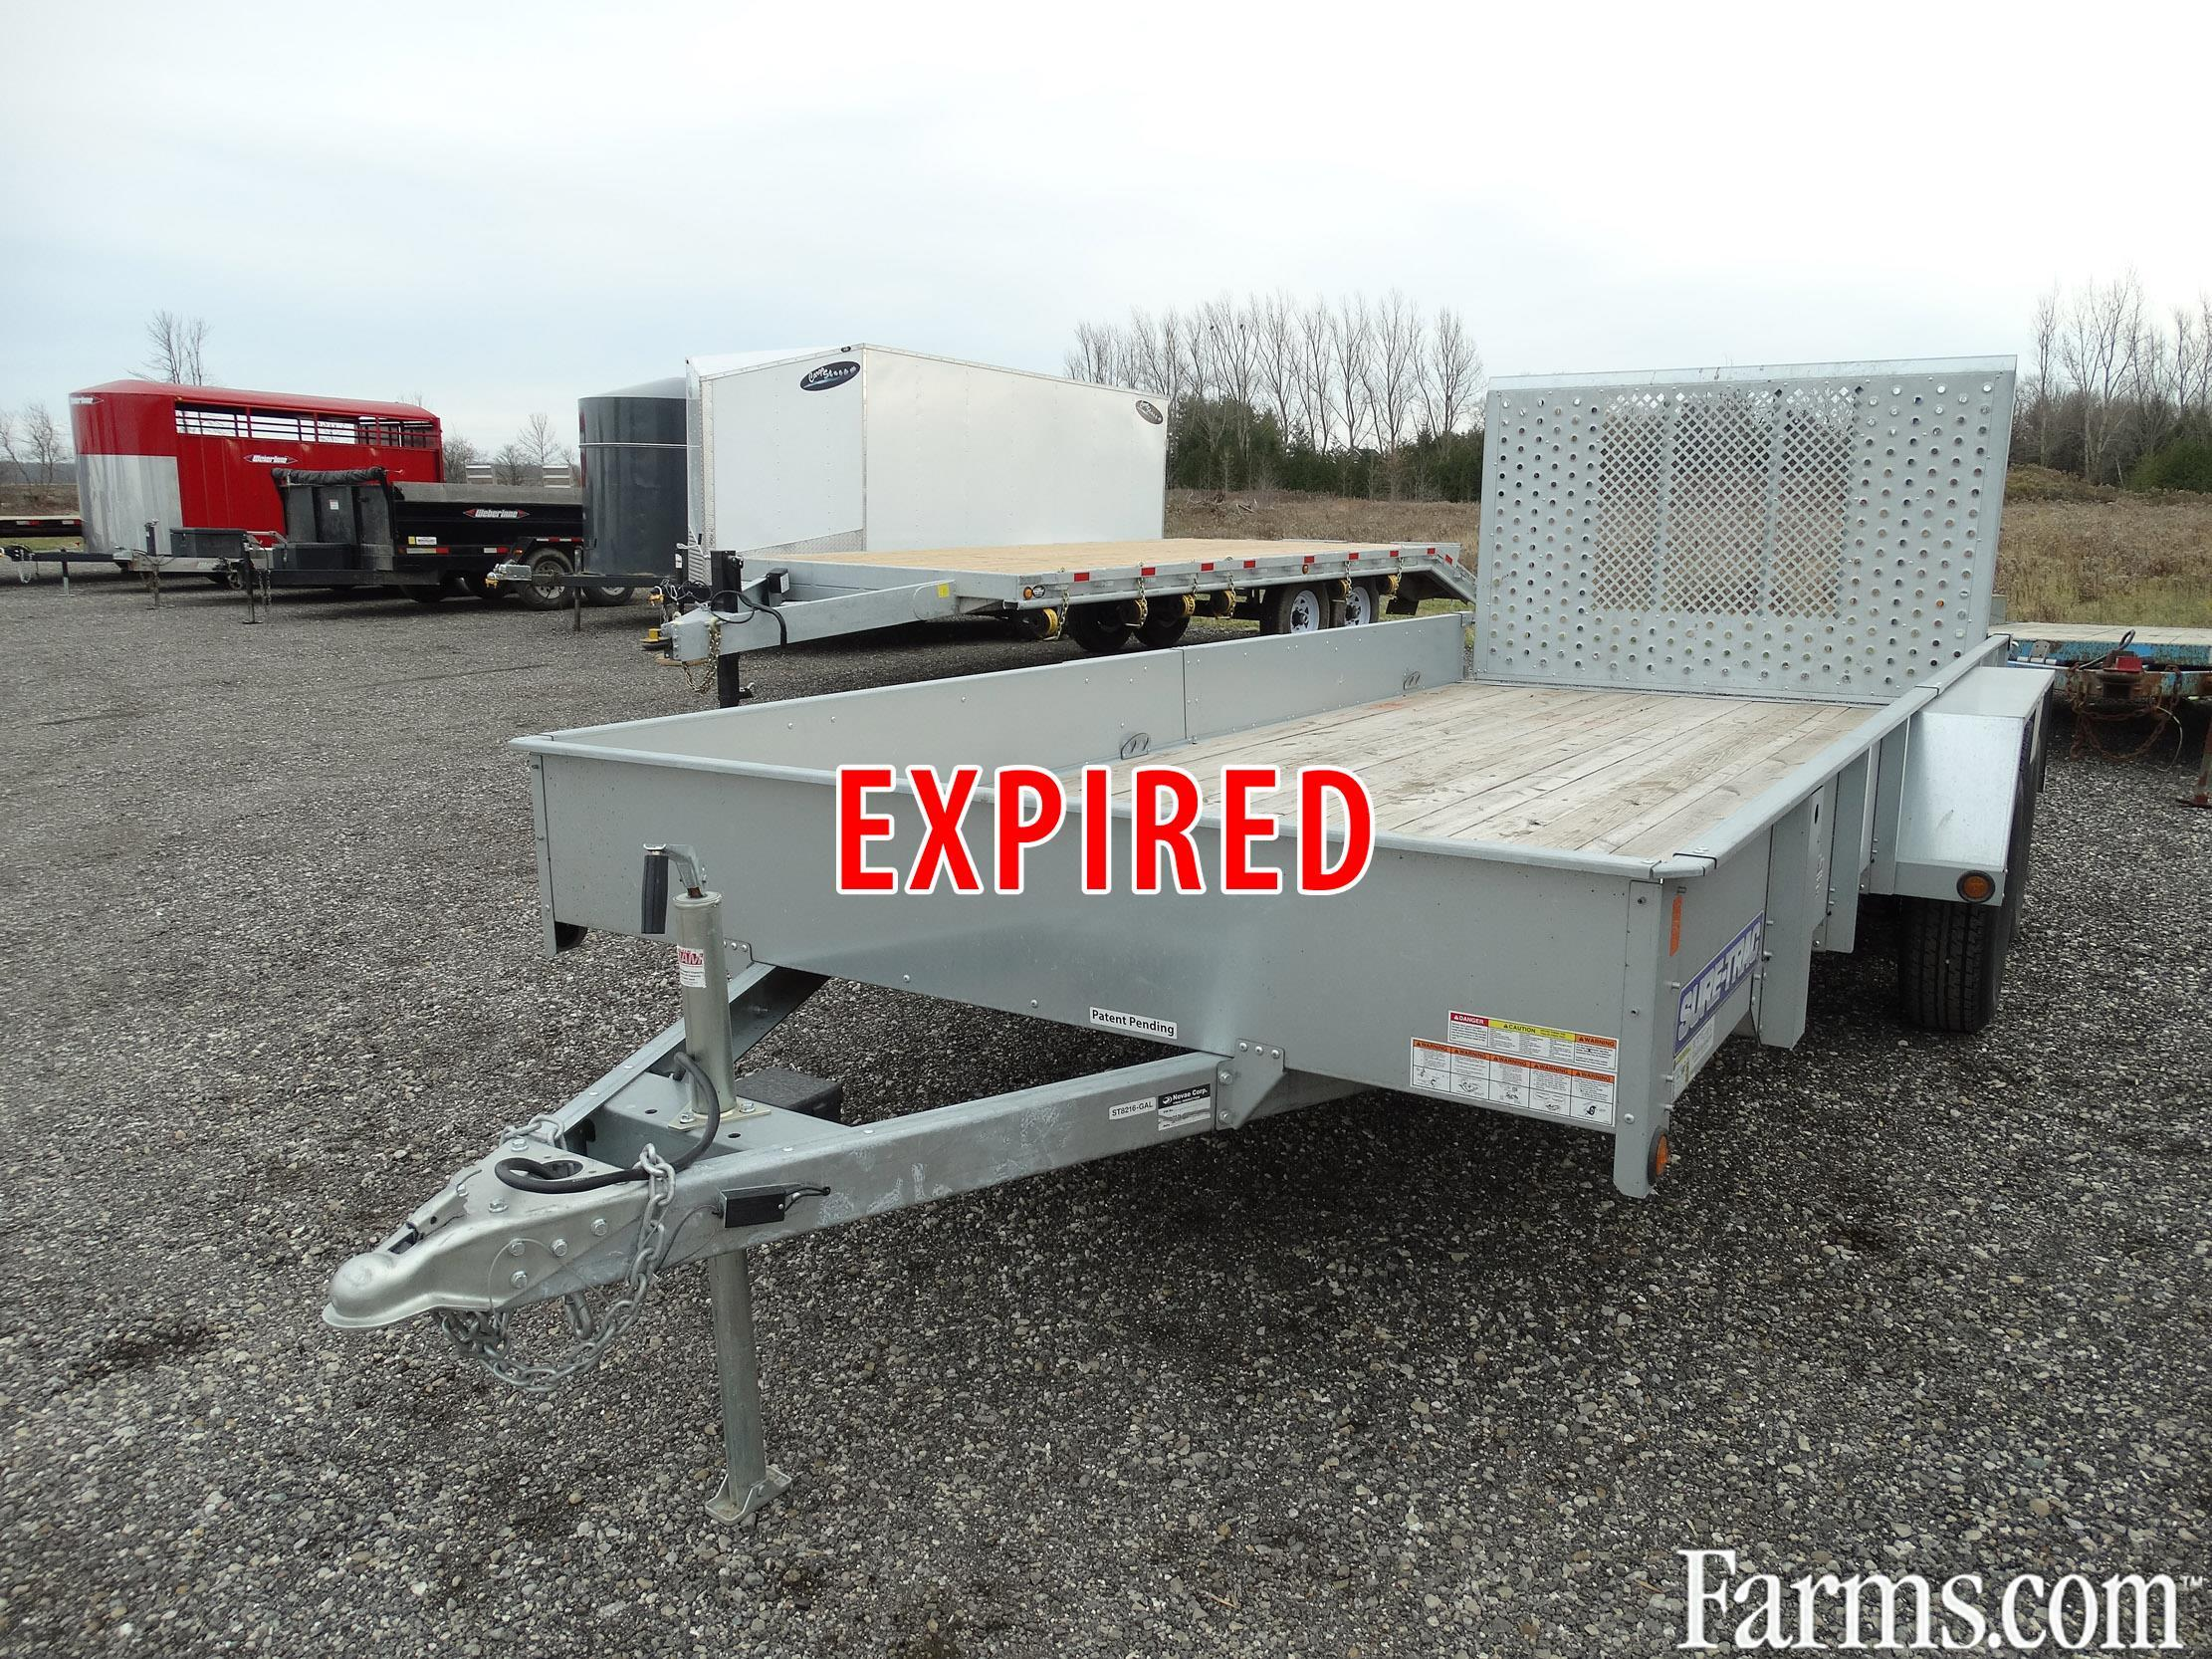 Used Tractor Trailers : Galvanized landscape trailer for sale farms